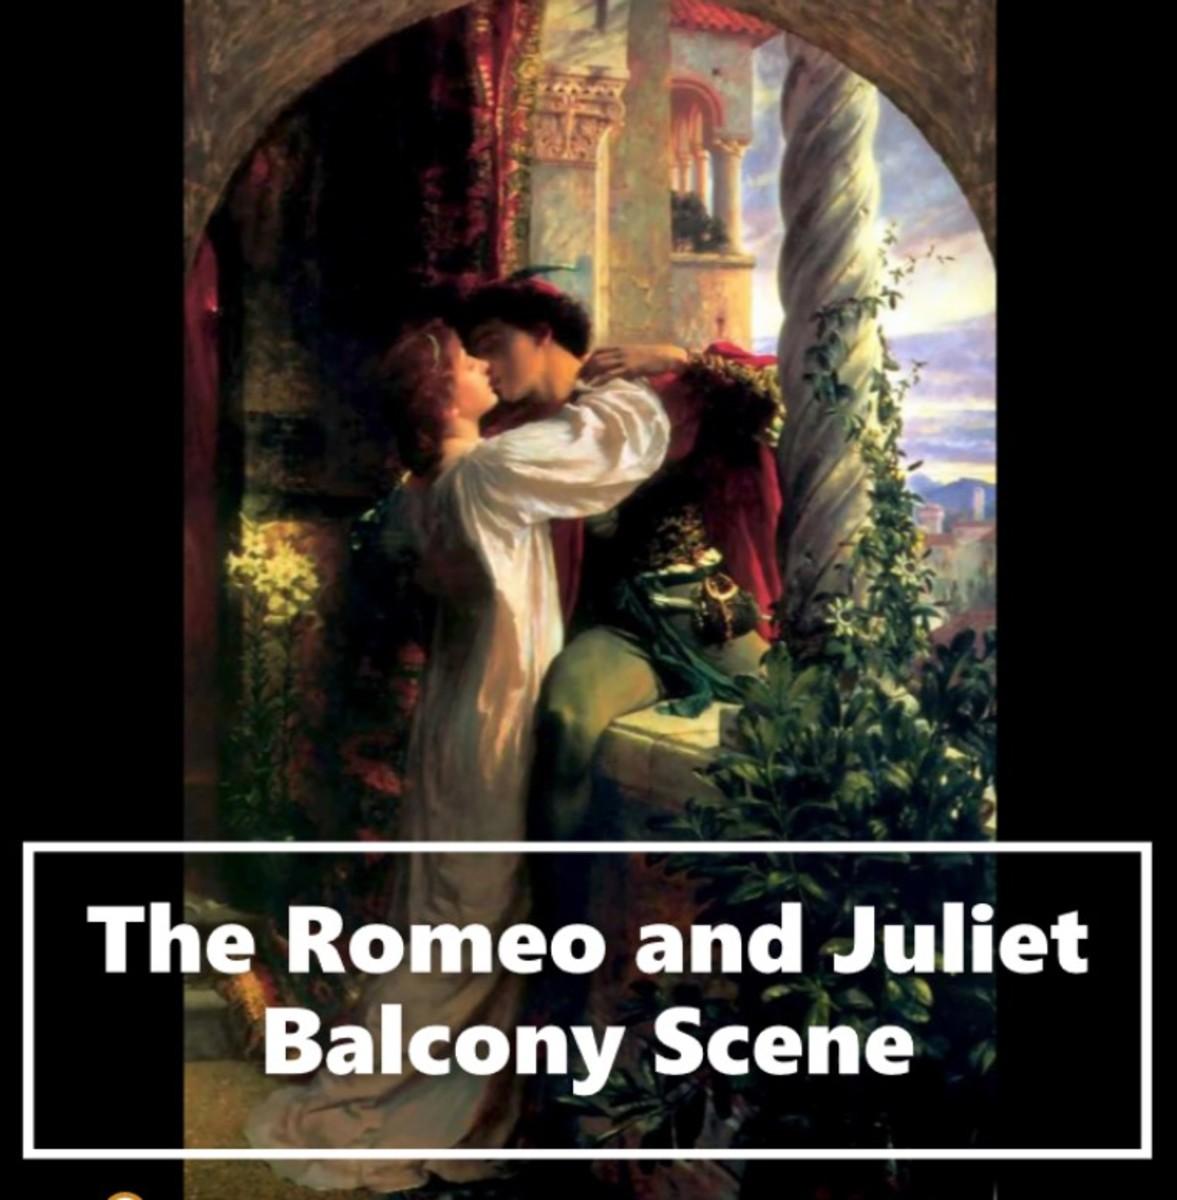 The Romeo and Juliet Balcony Scene